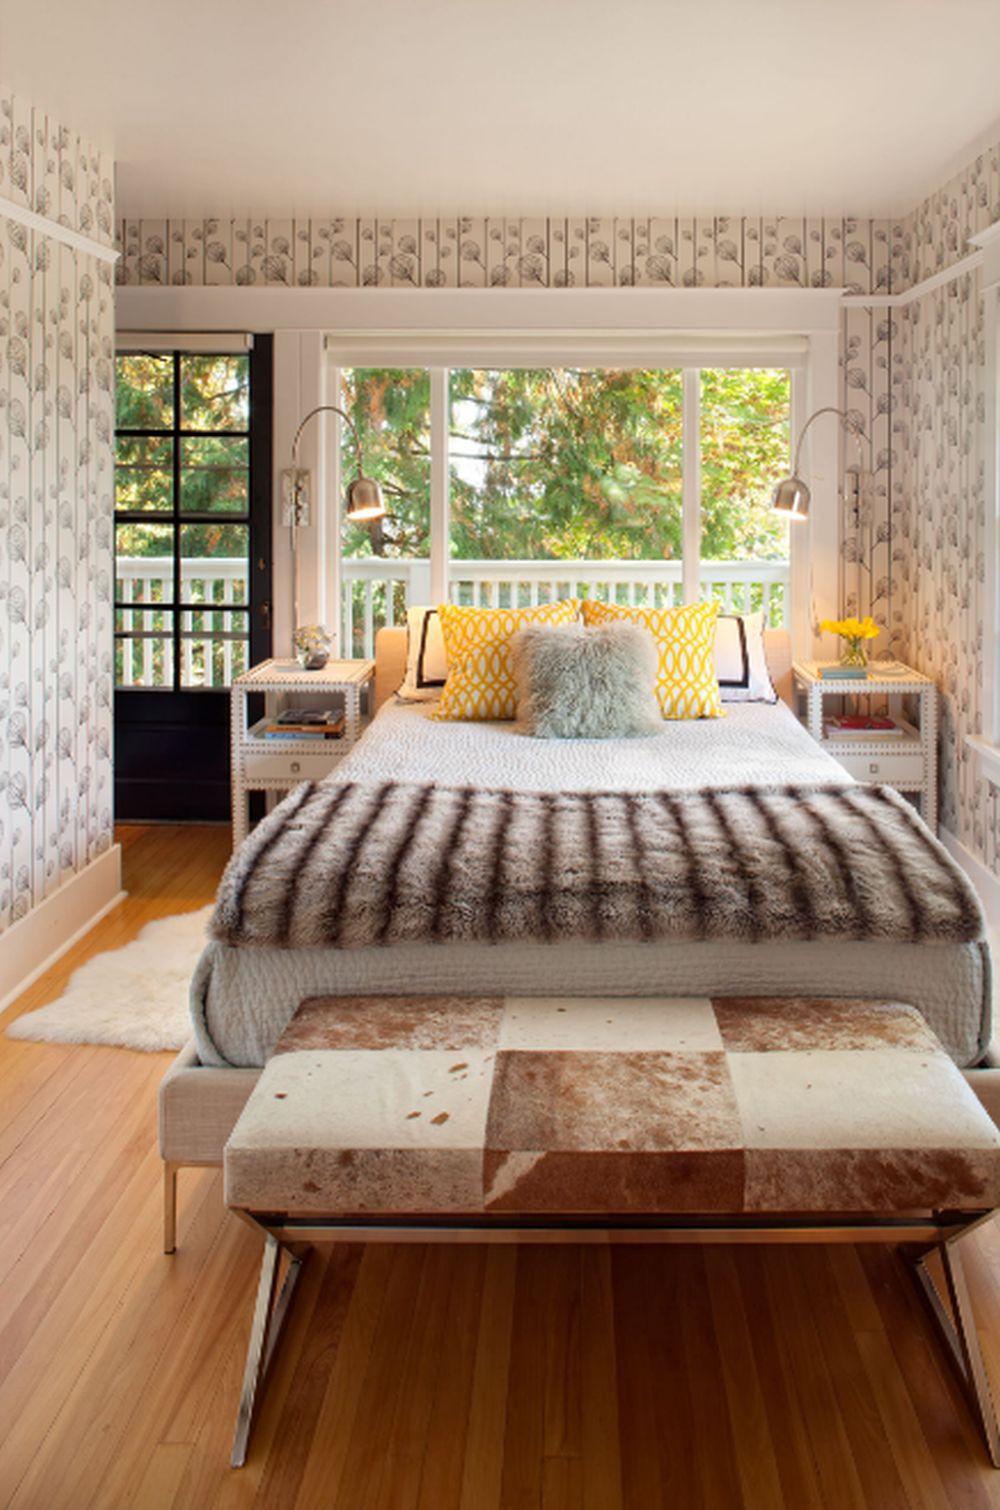 adelaparvu-com-despre-cum-iti-aranjezi-patul-foto-vanillawood